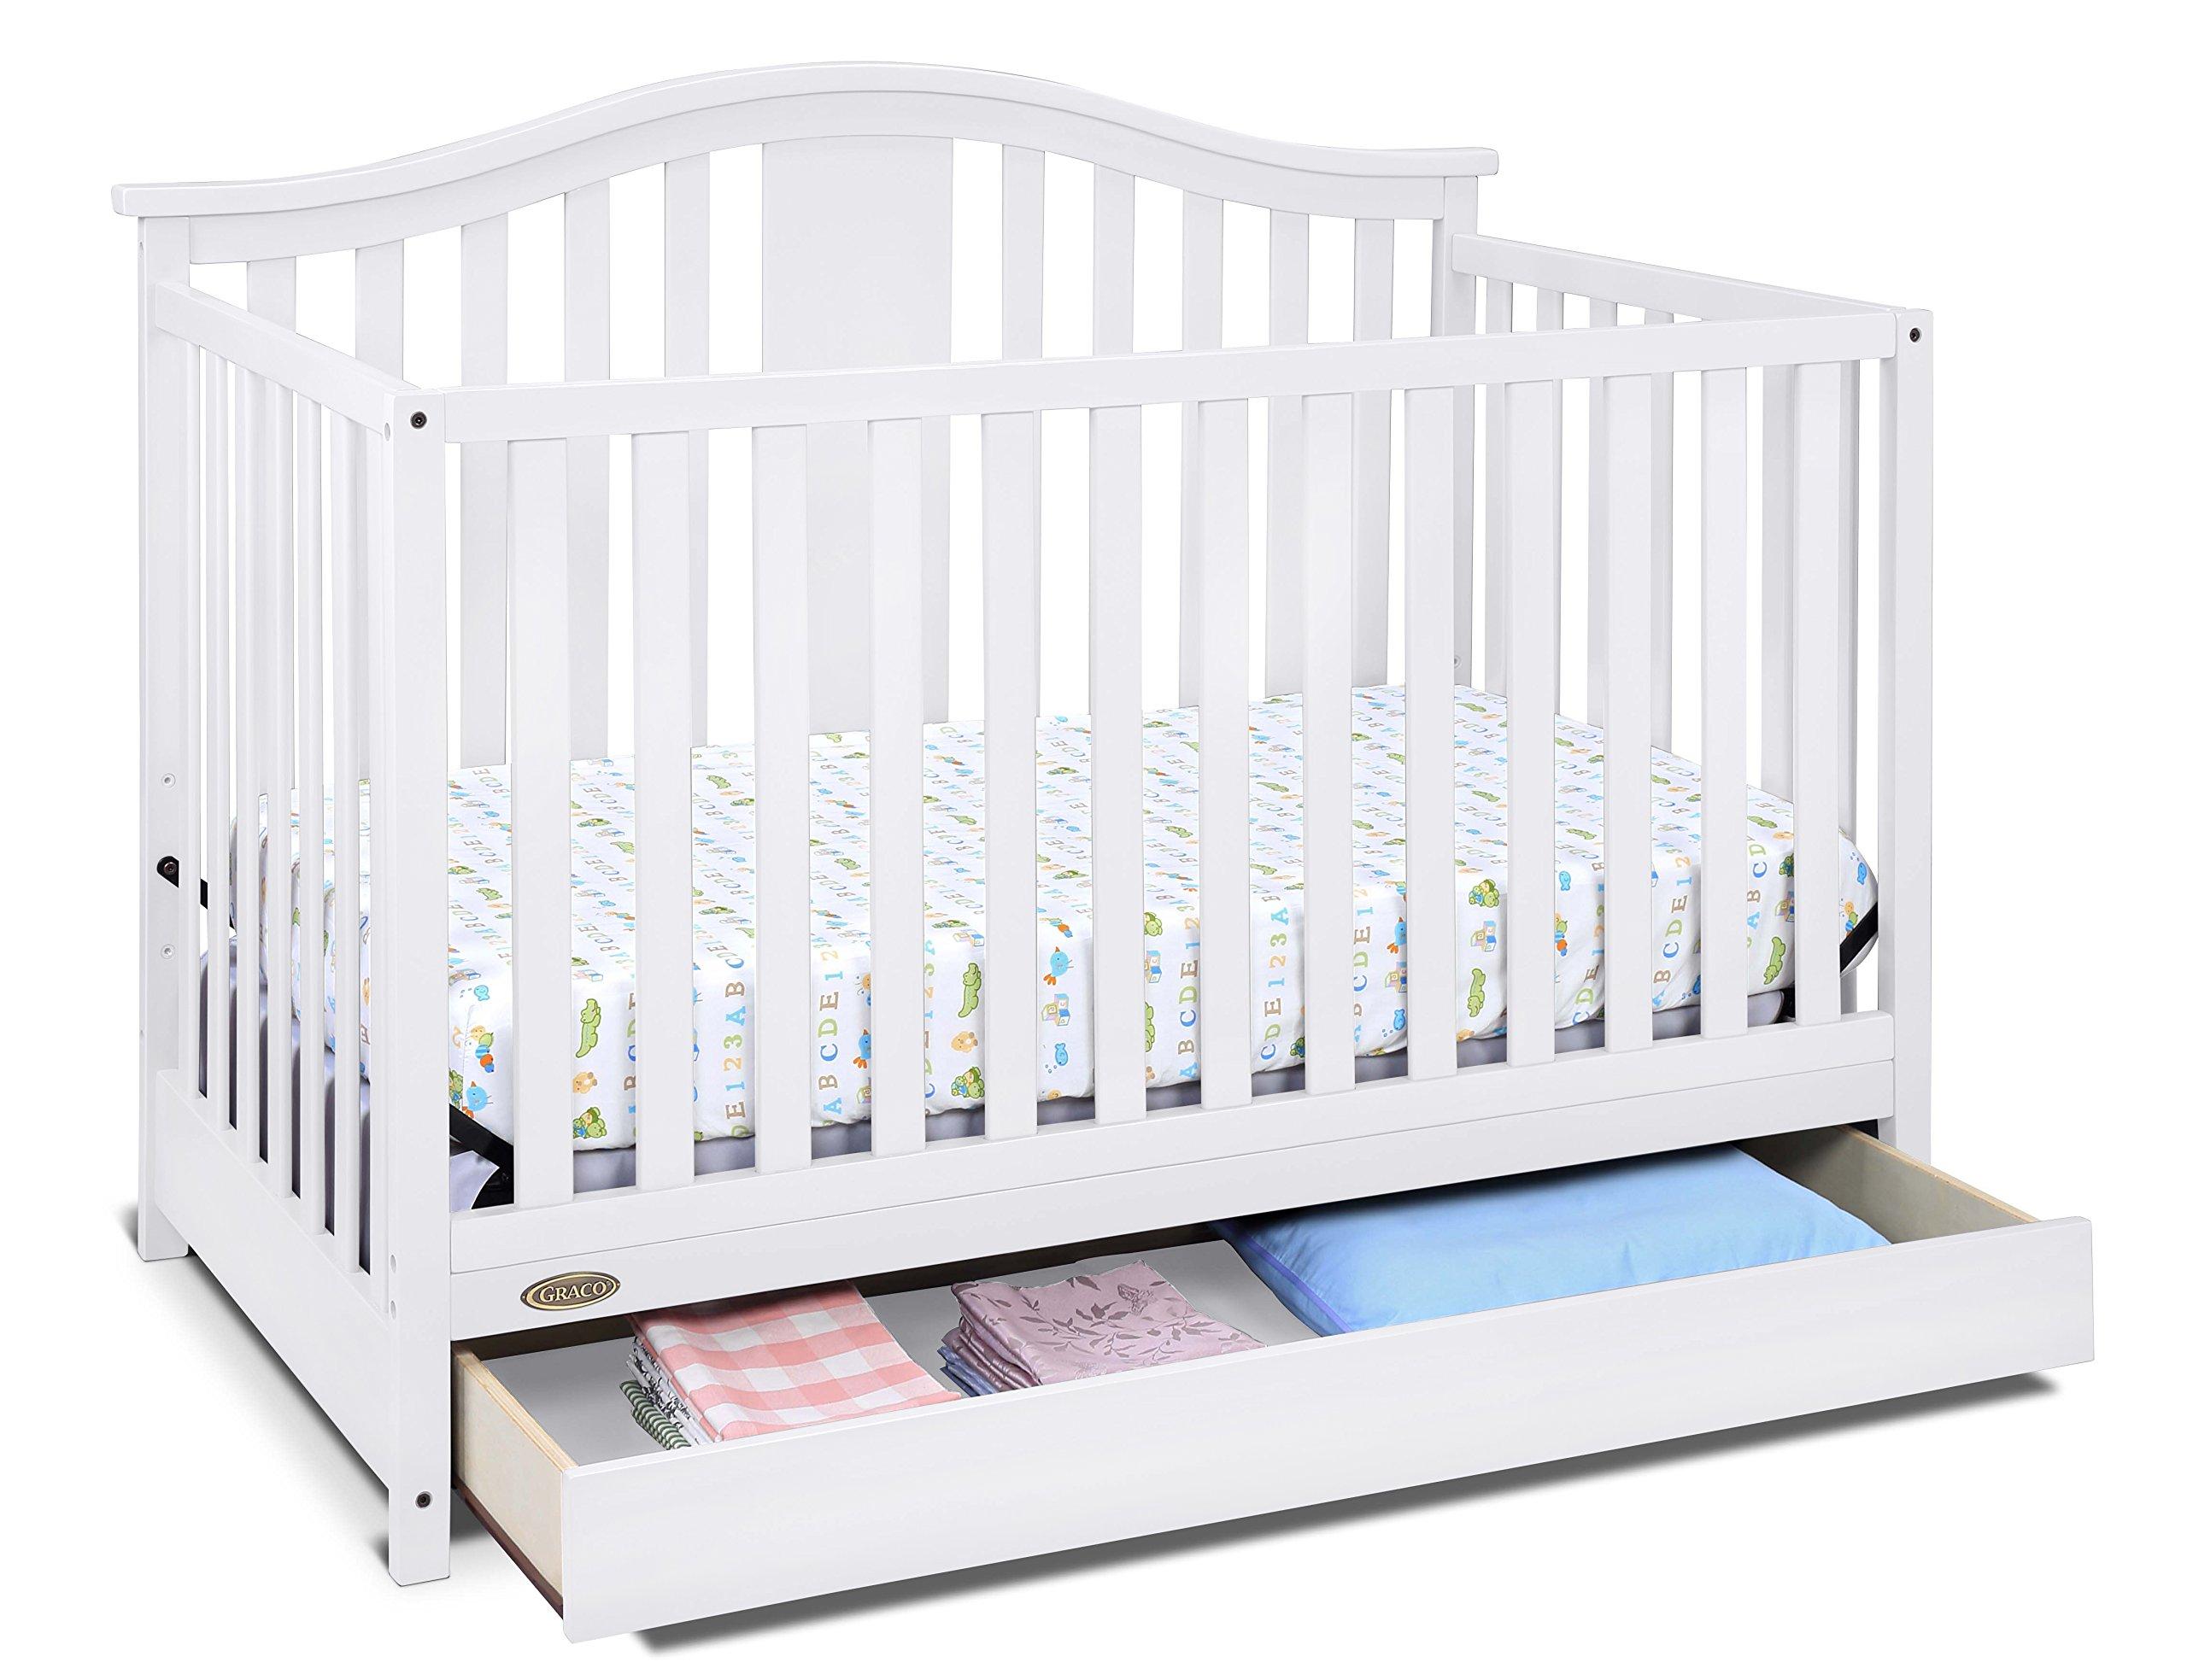 Amazon.com : Graco Toddler GuardRail, White, Safety Guard ...